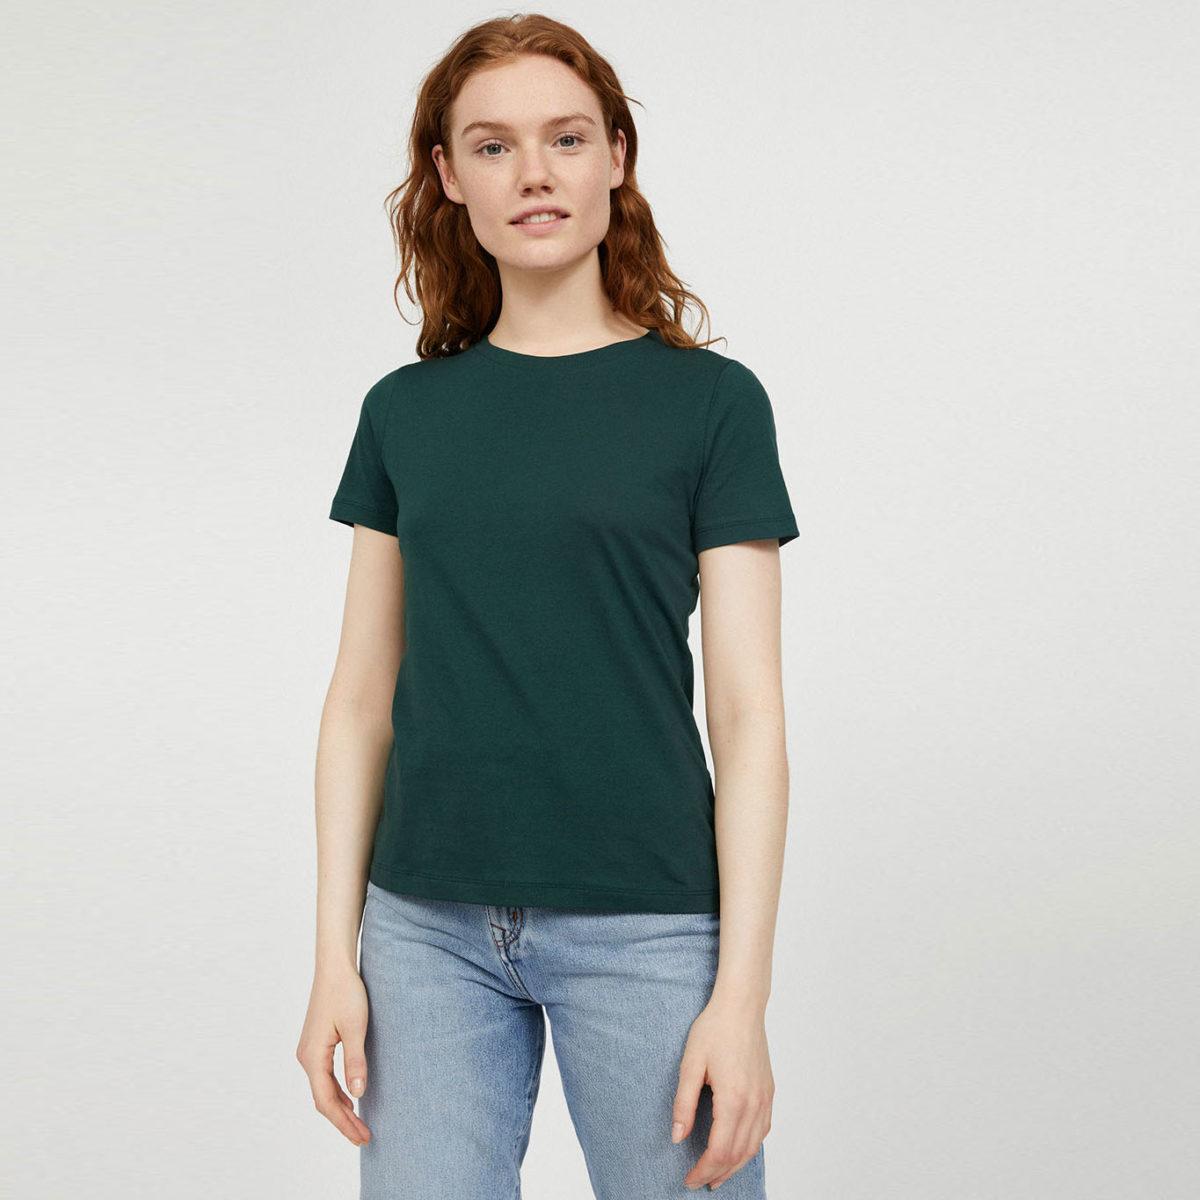 T-shirt från Armedangels i 100% ekologisk bomull. Lidas Deep Lake